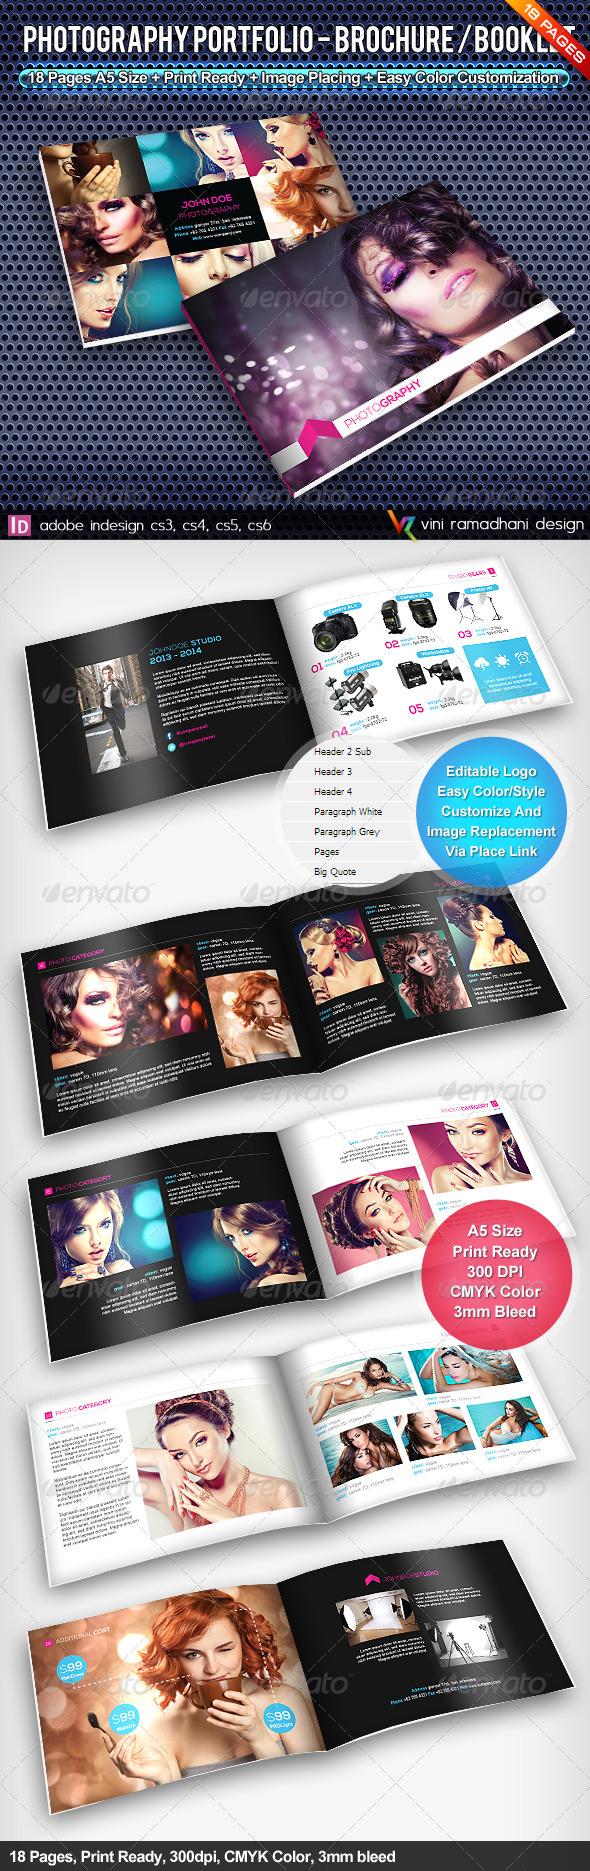 GraphicRiver Photography Portfolio Brochure Booklet 4526996